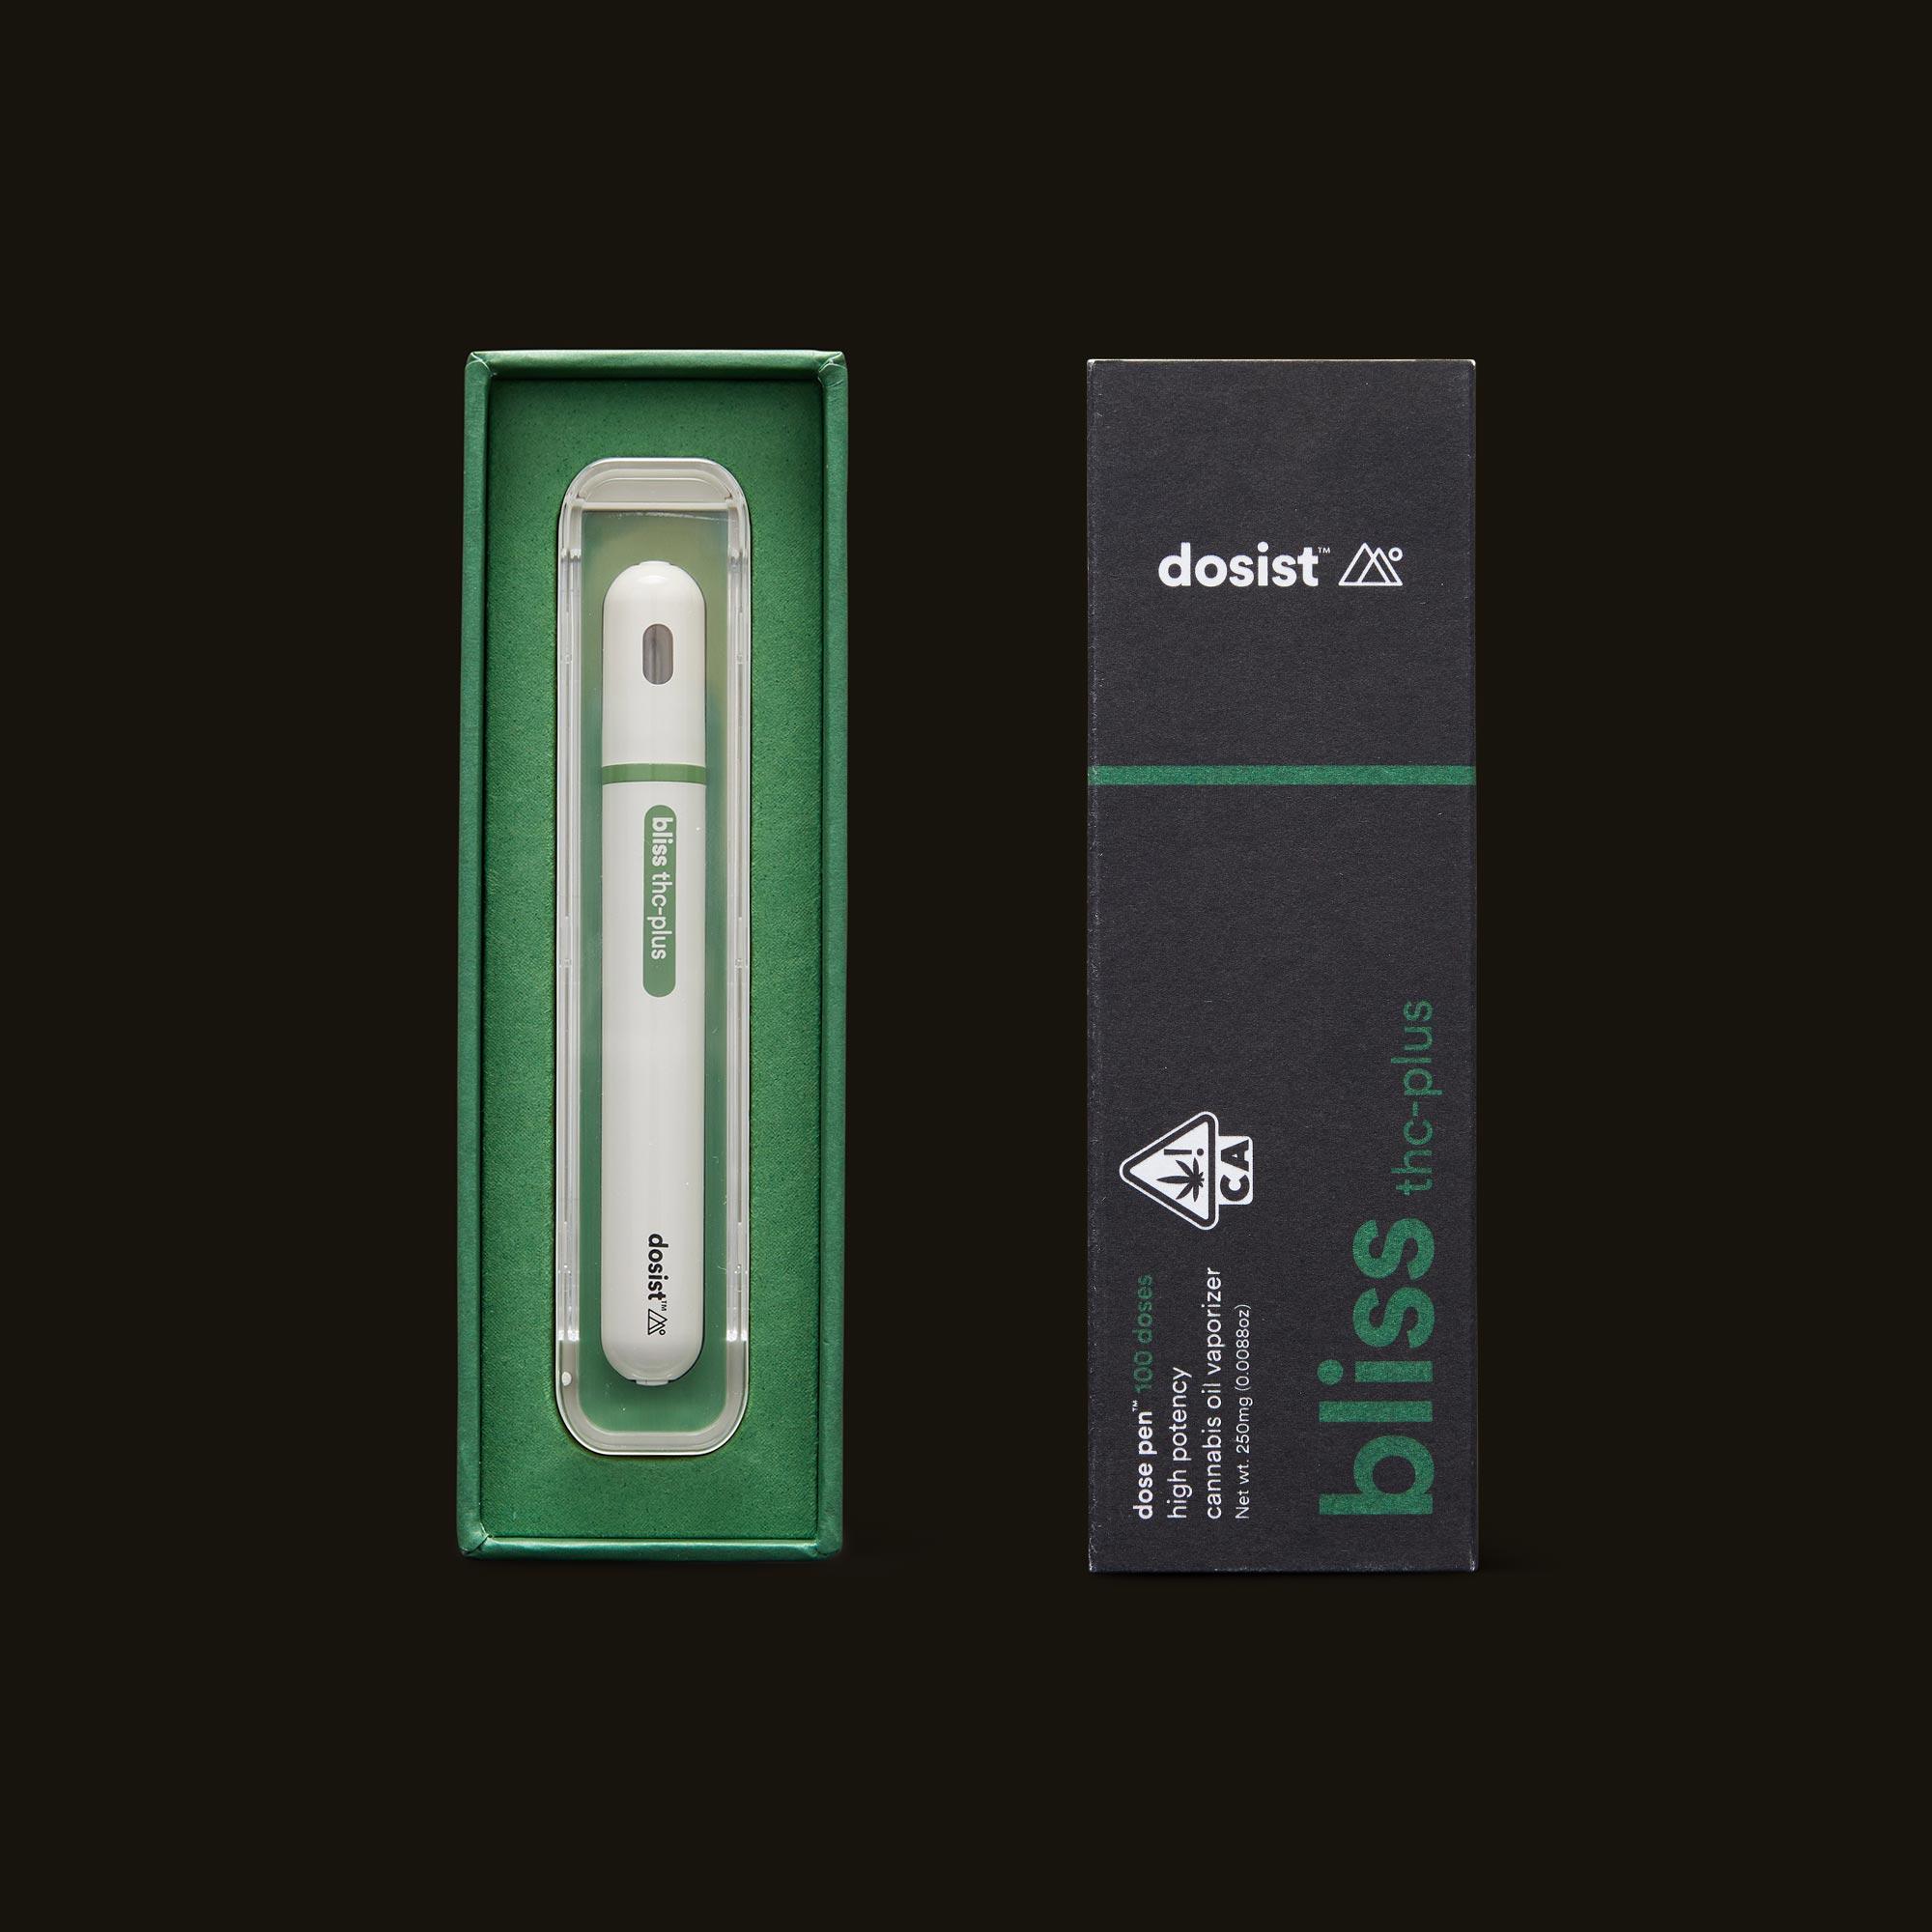 dosist bliss thc-plus dose pen open box